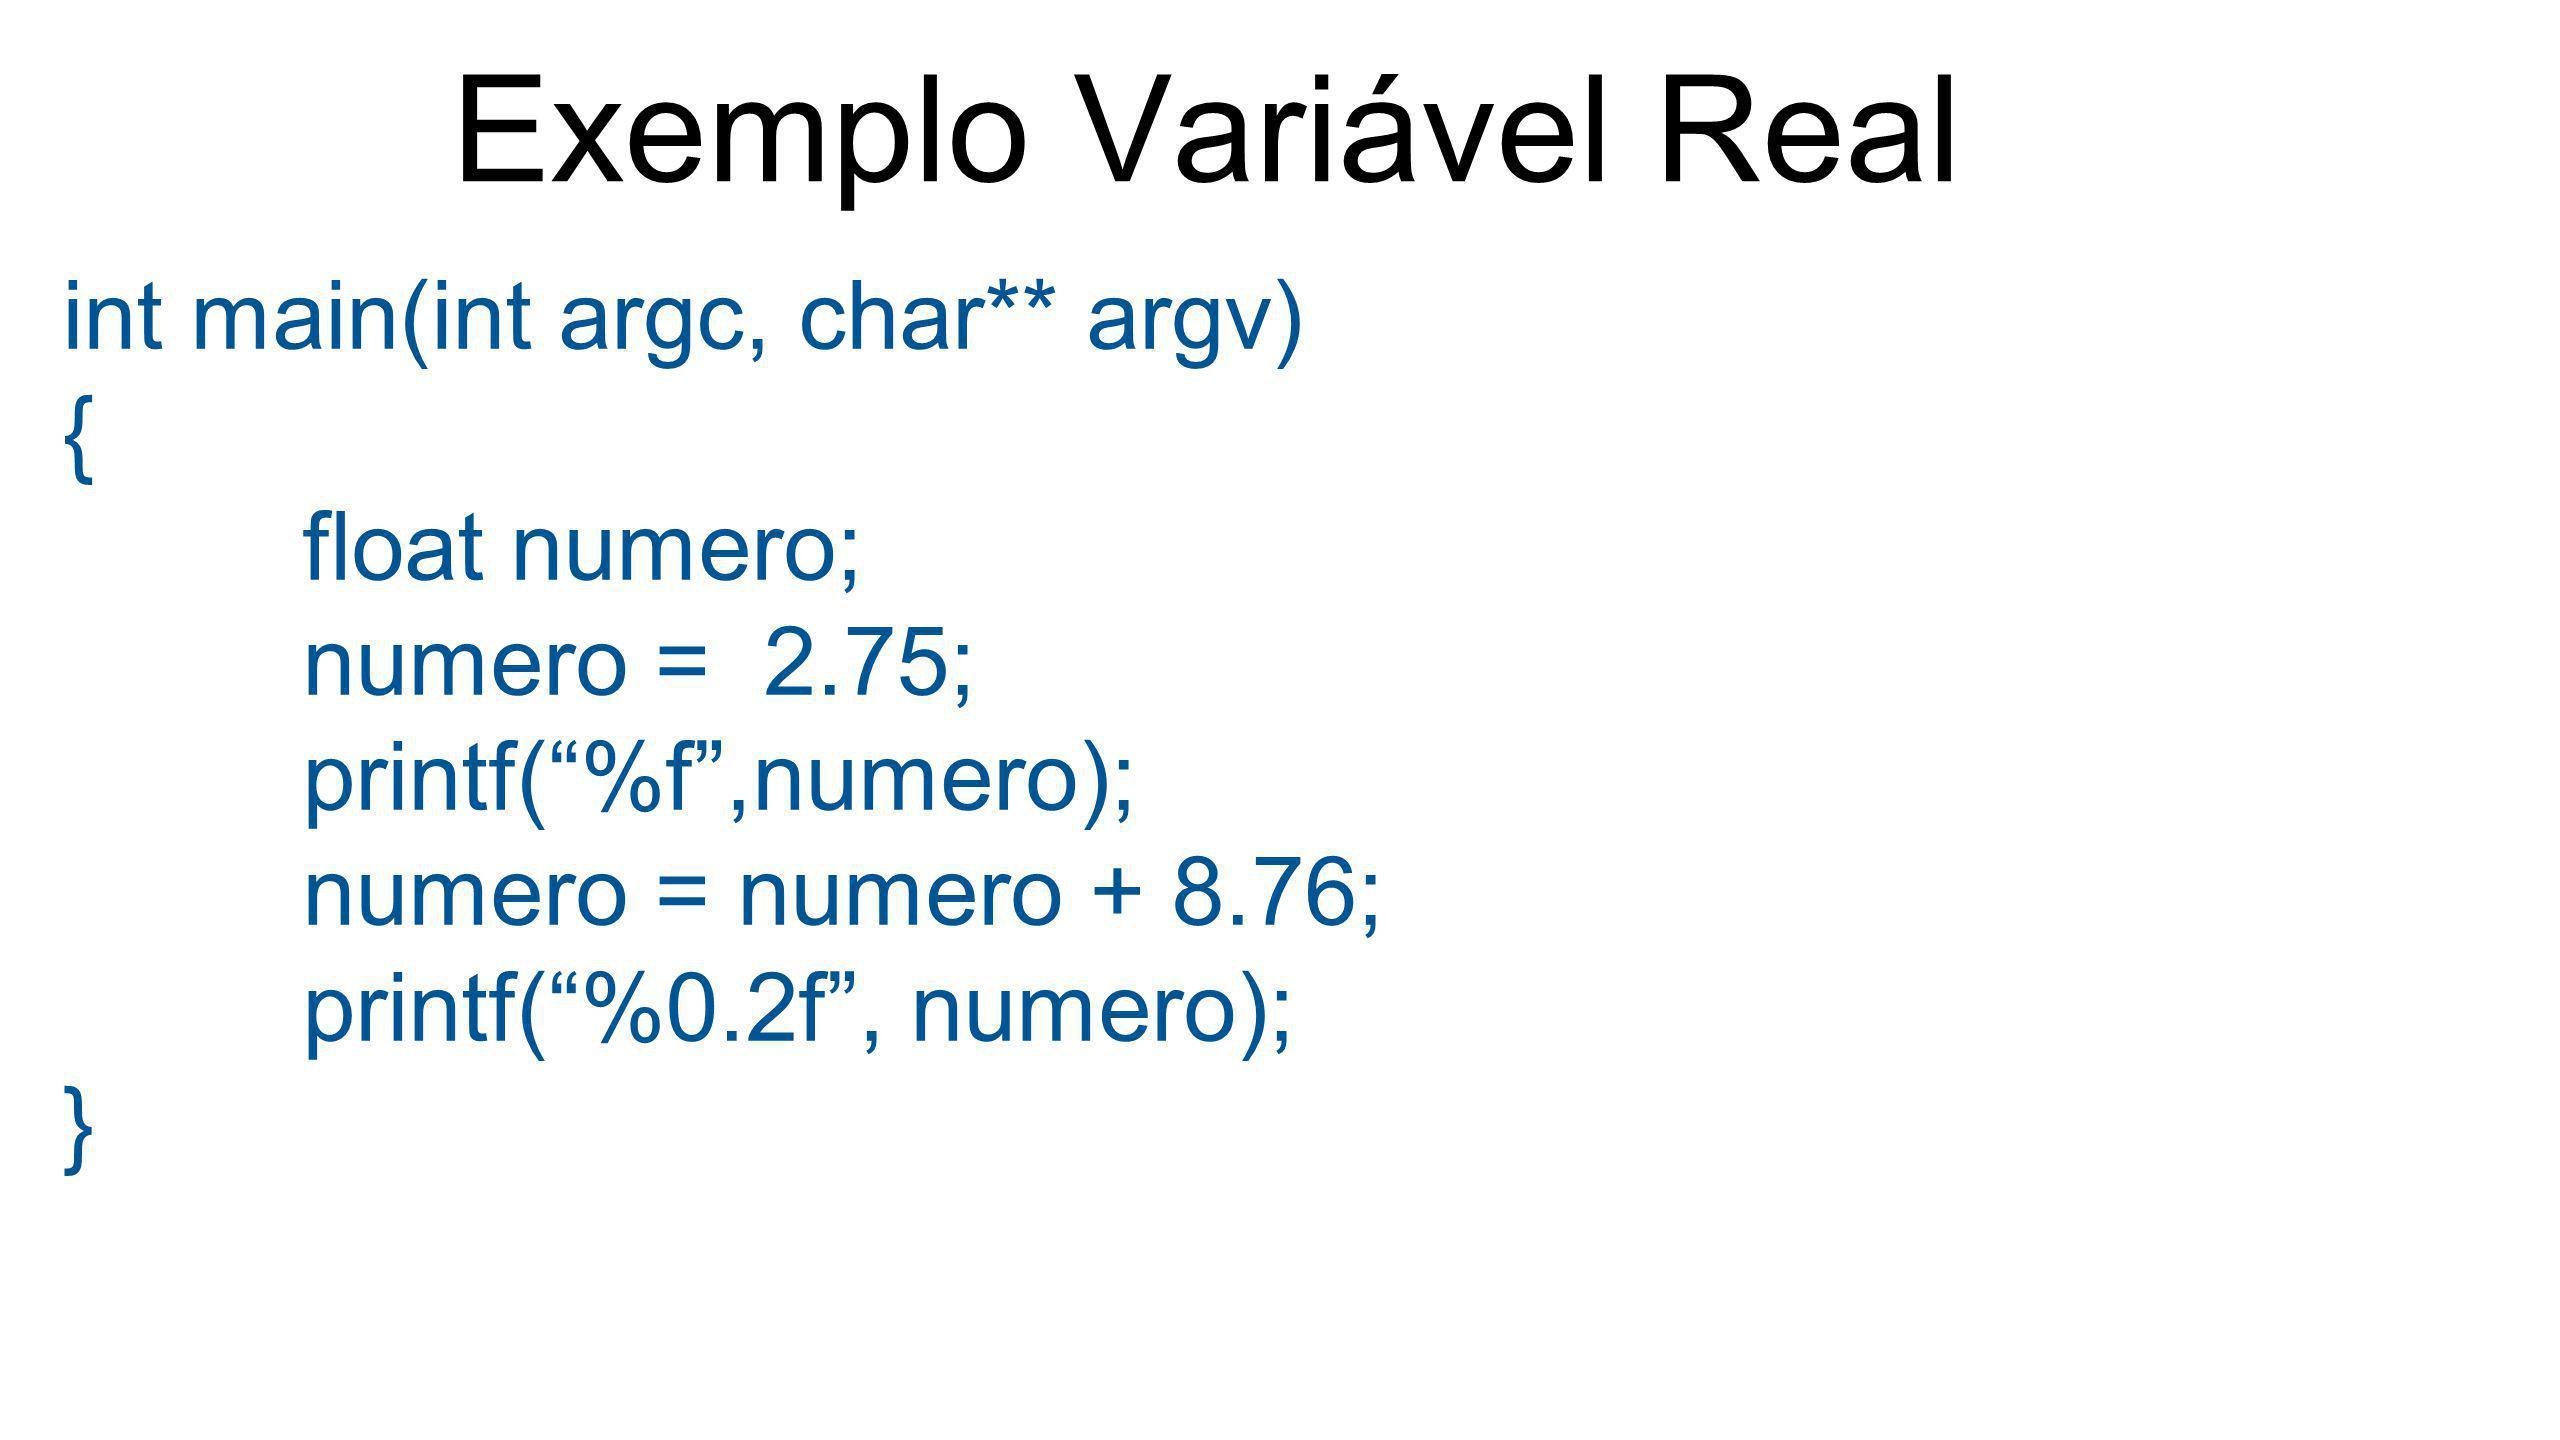 "Exemplo Variável Real int main(int argc, char** argv) { float numero; numero = 2.75; printf(""%f"",numero); numero = numero + 8.76; printf(""%0.2f"", nume"